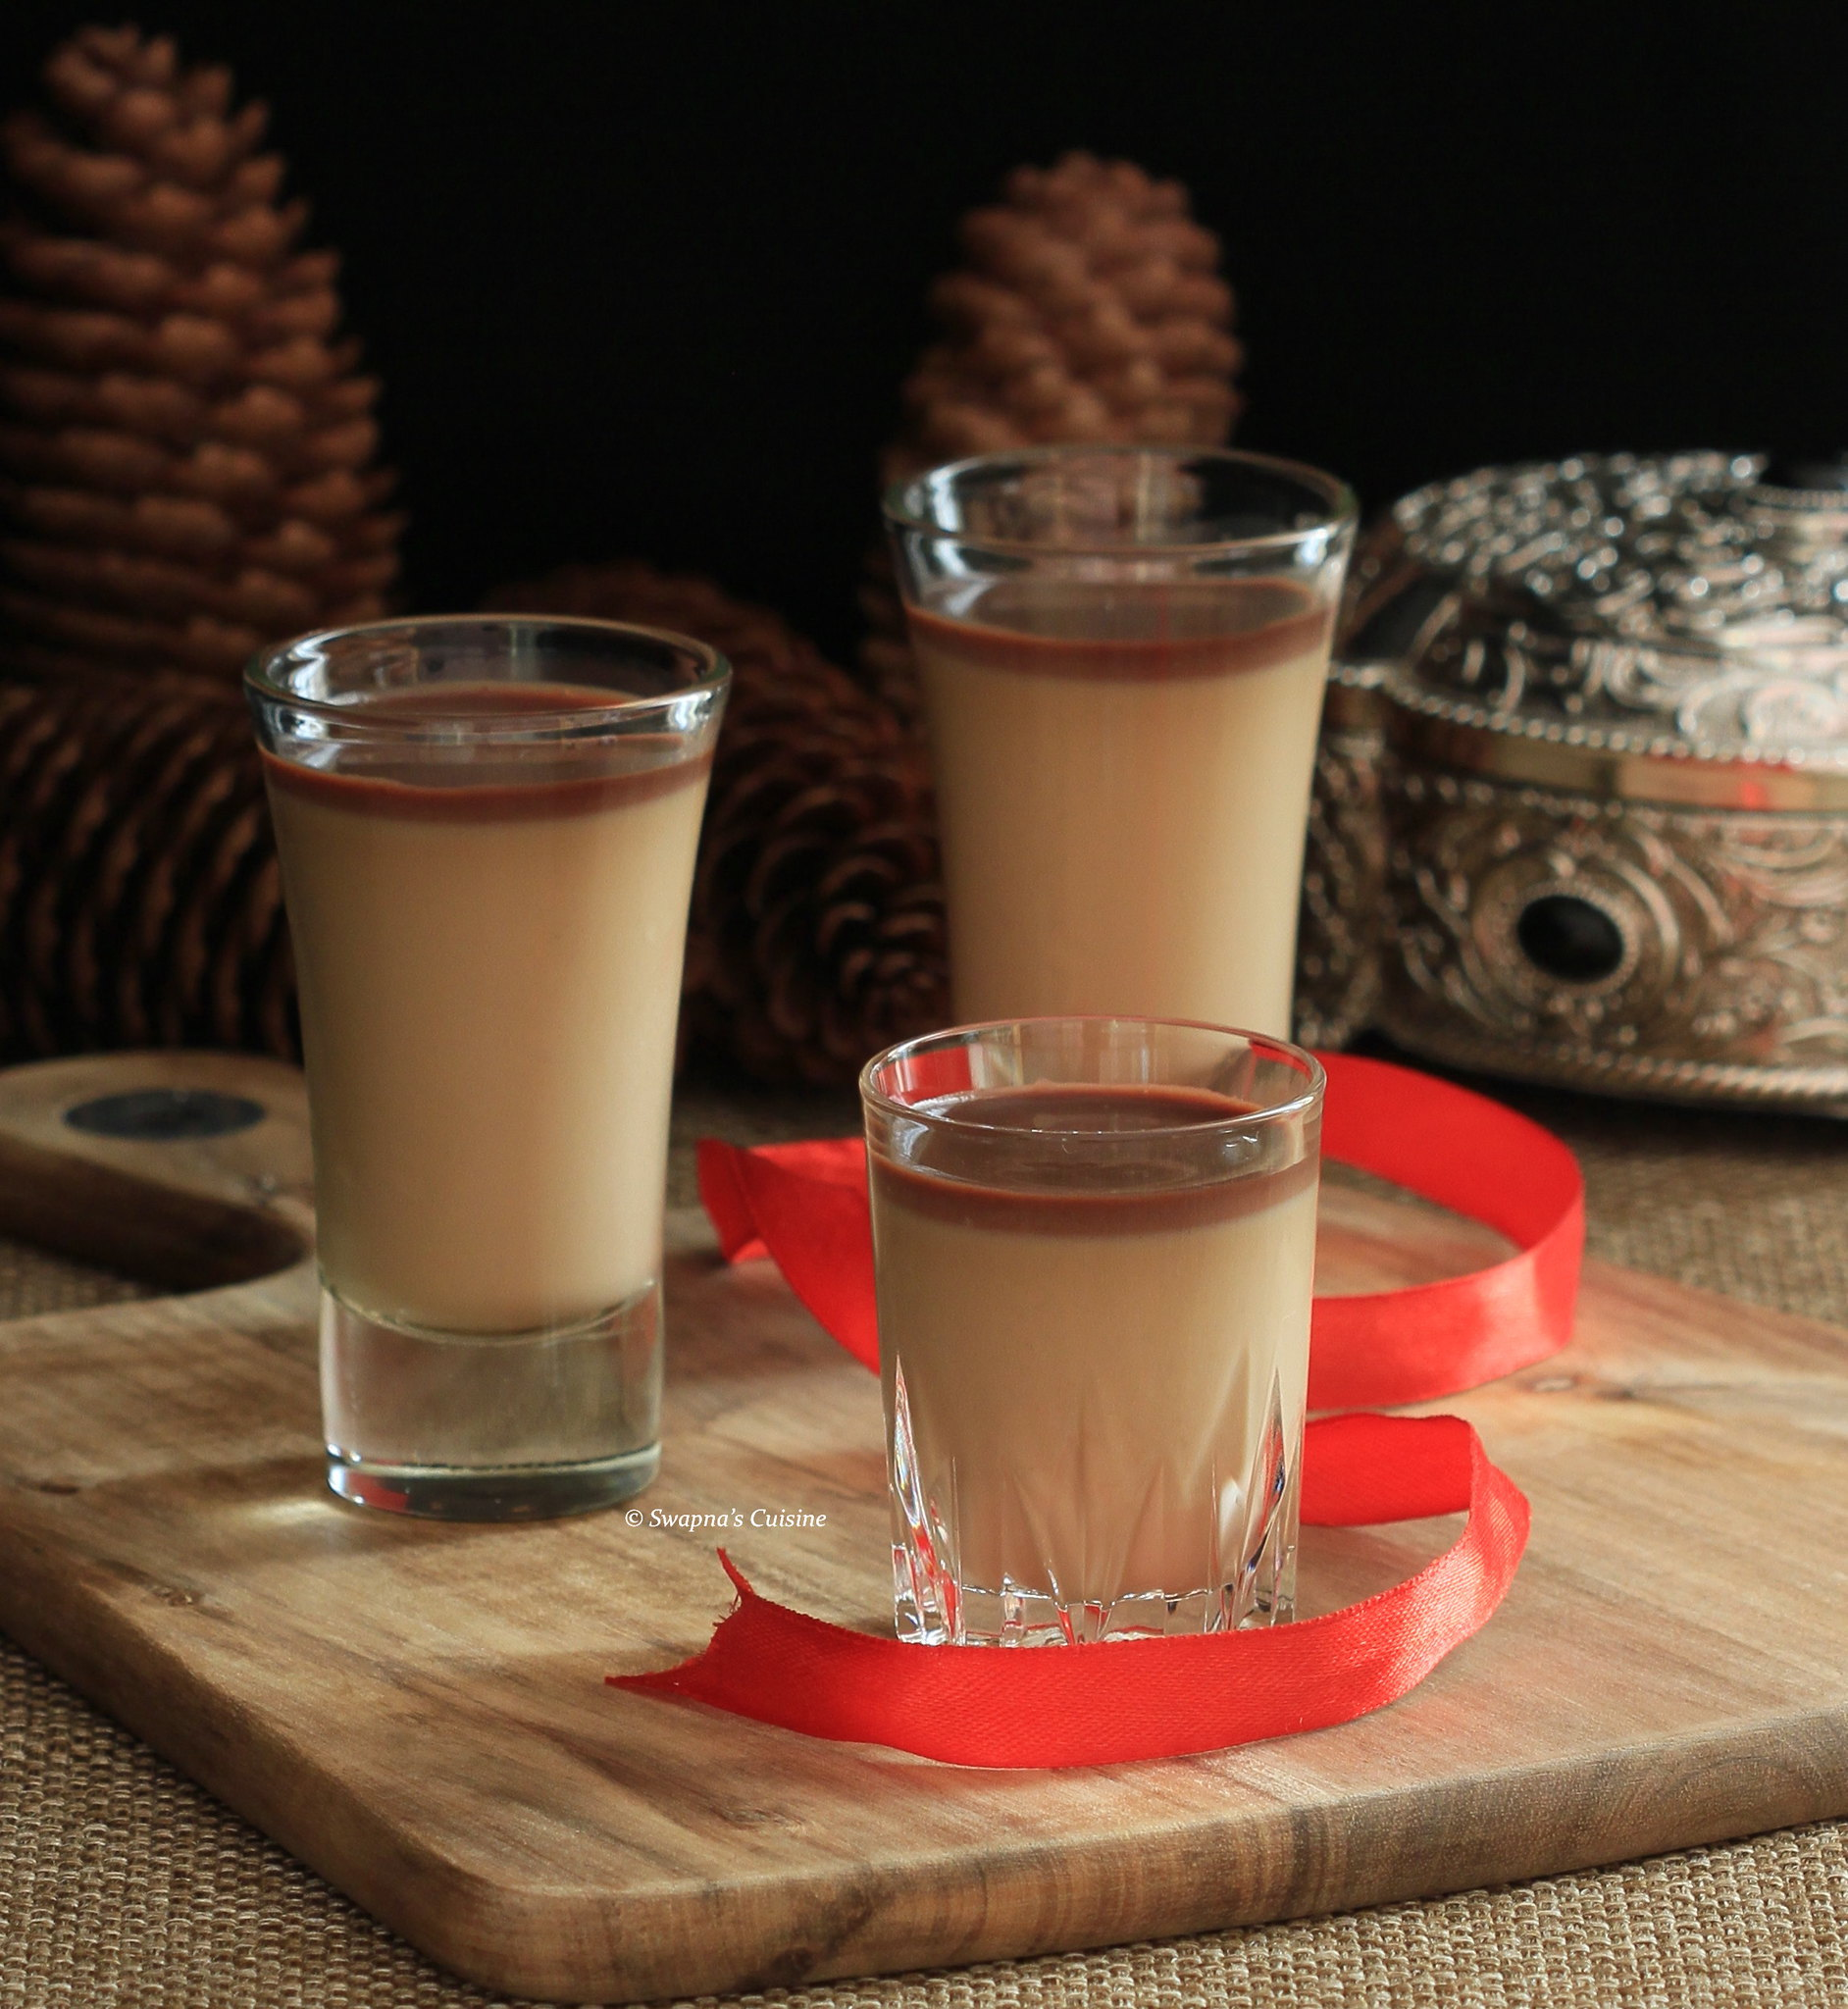 Recipe for Coffee Panna Cotta